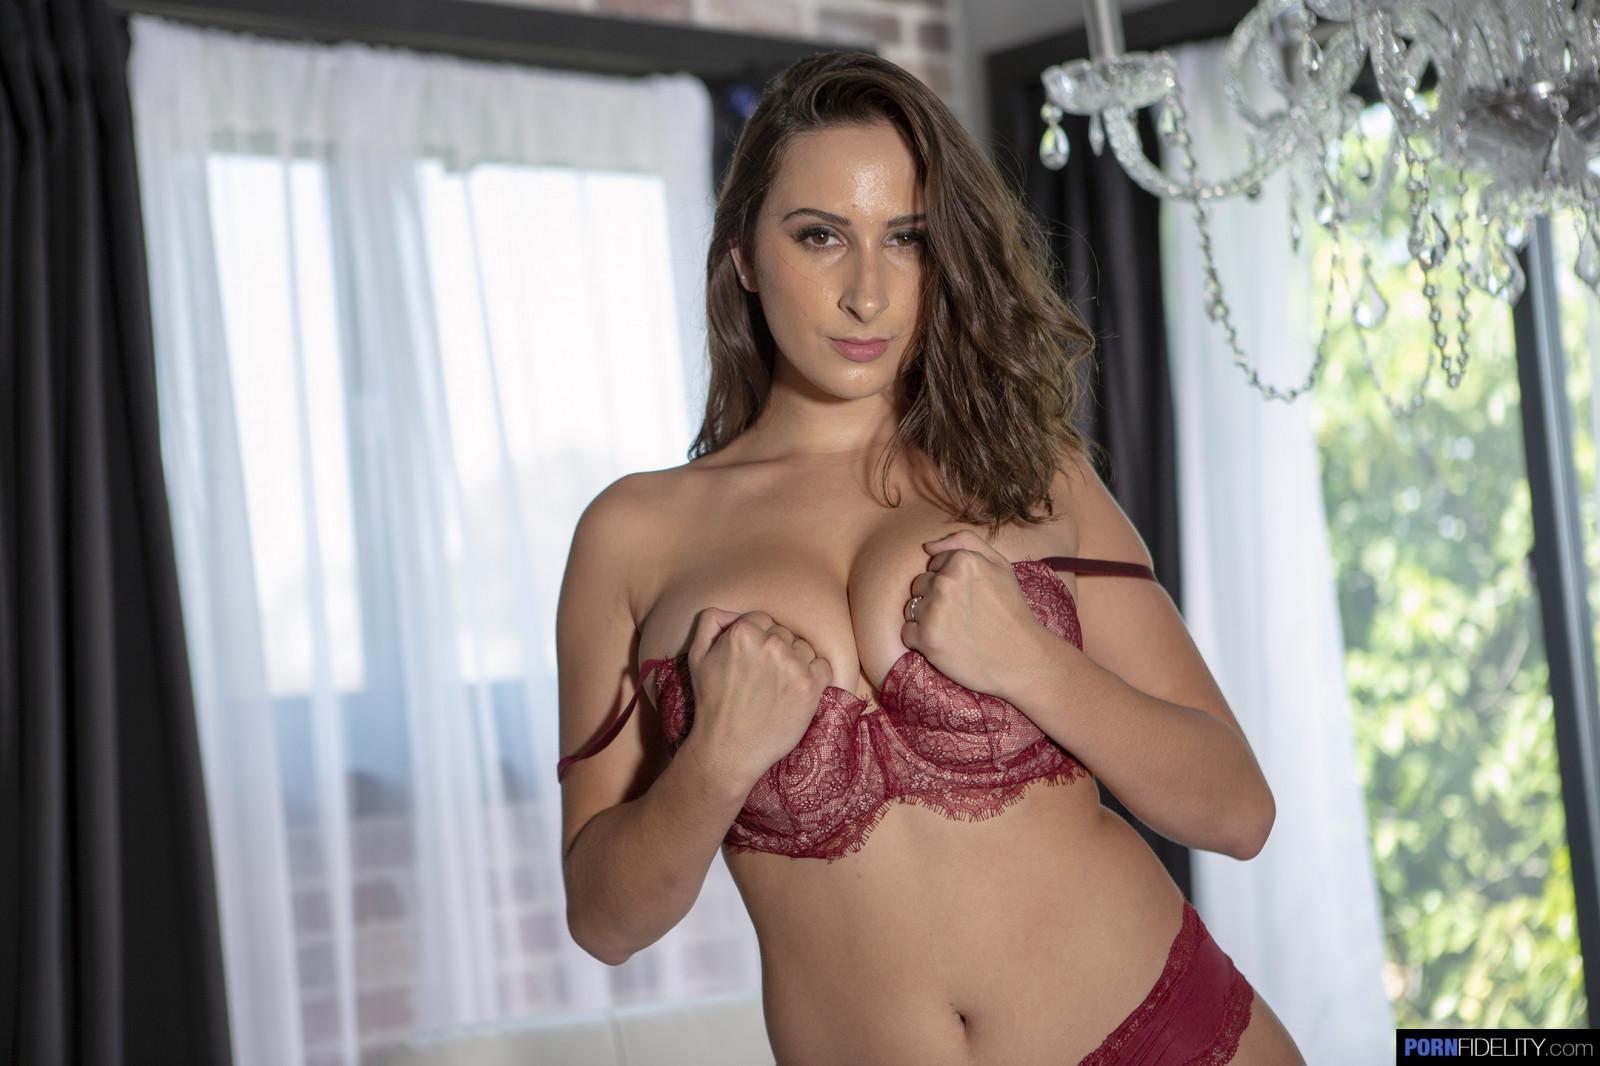 Wallpaper : Ashley Adams, pornstar, red lingerie, hands on